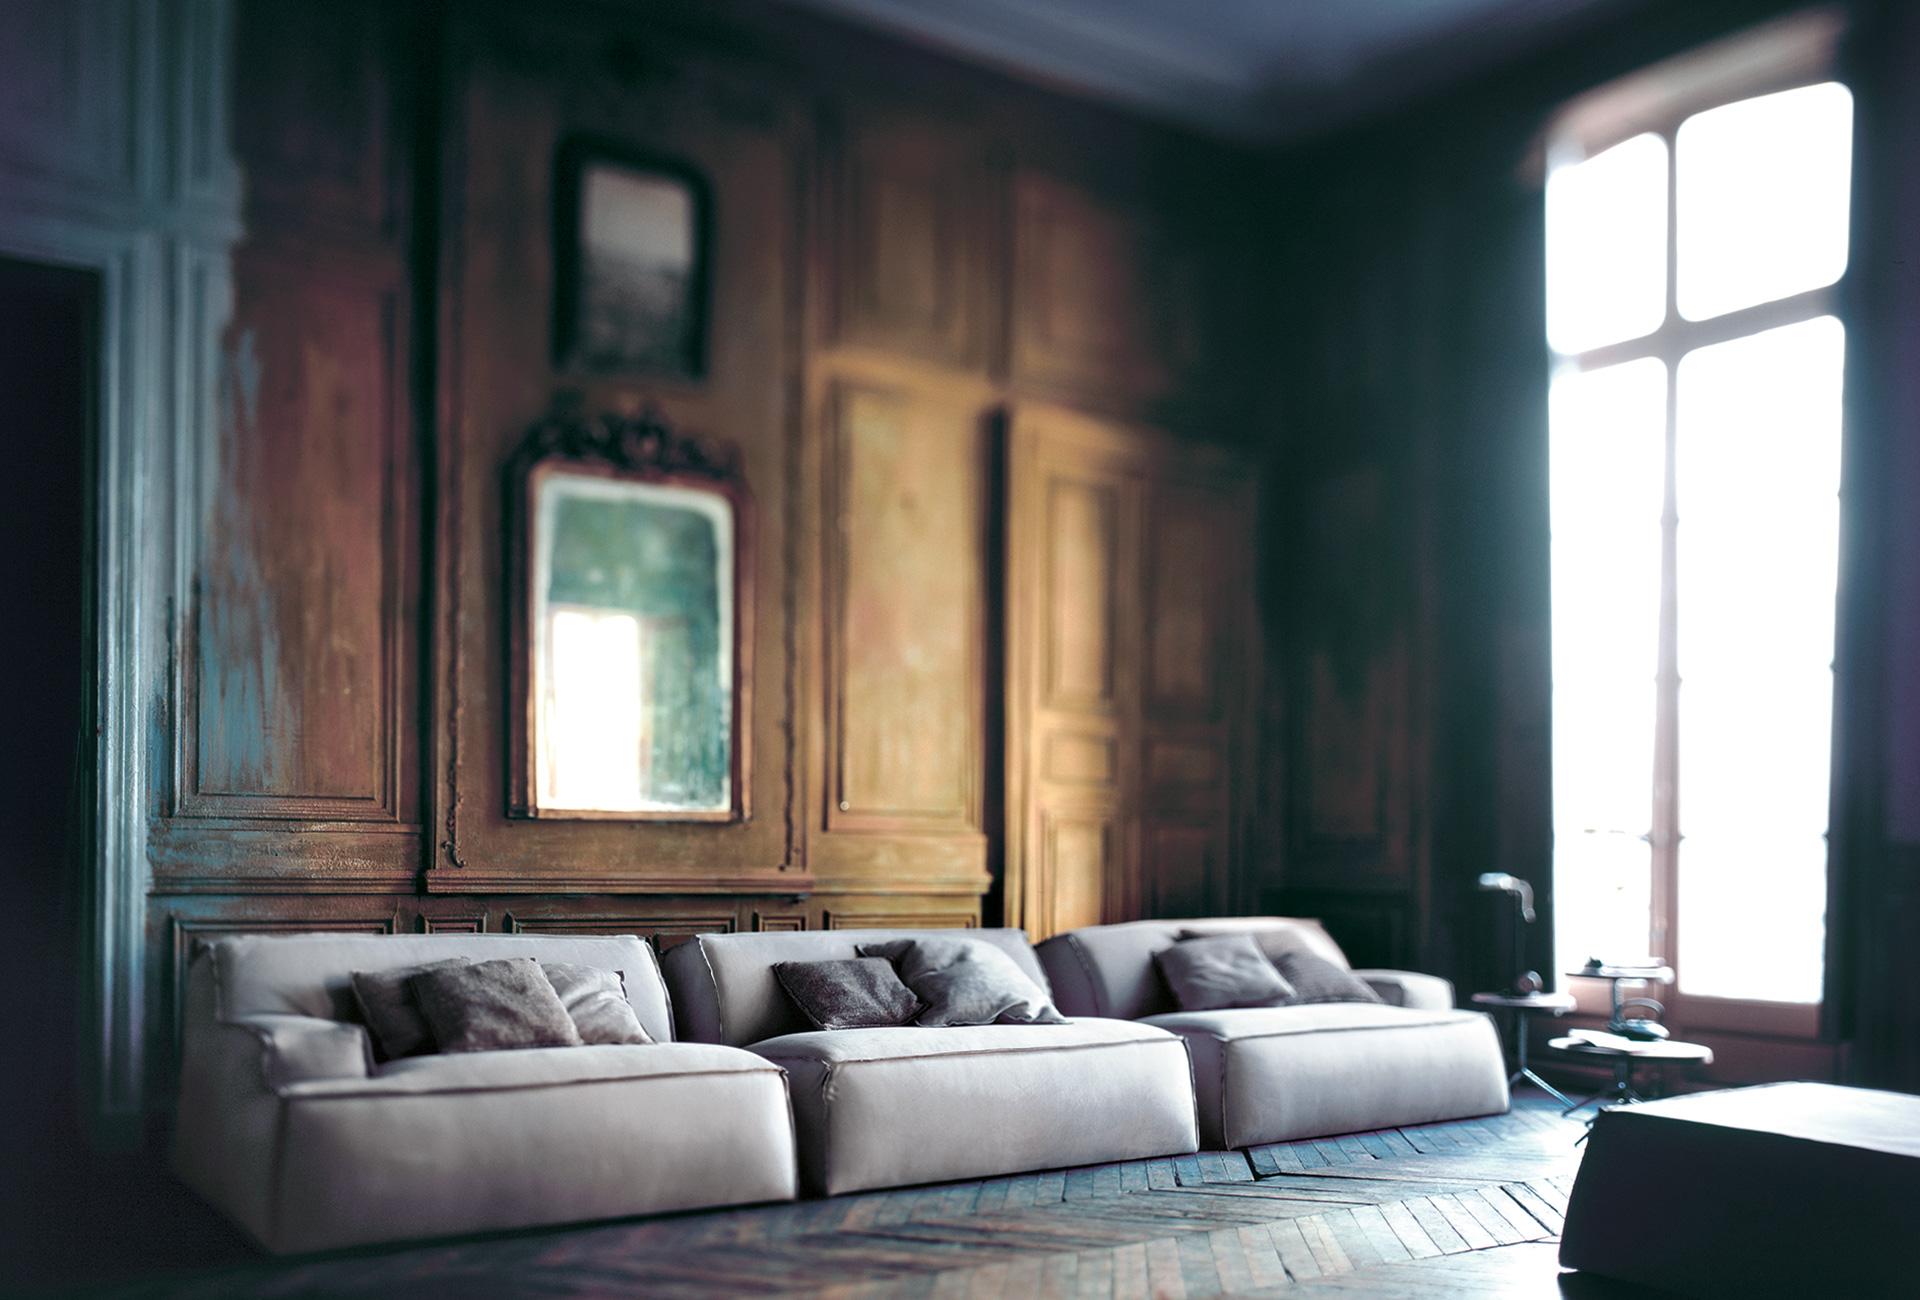 Full Size of Baxter Sofa Jonathan Adler Chester Moon Furniture List Paola Navone Ez Living Budapest Viktor Cena Casablanca Damasco Leather Stilecht Leinen Polster Xora Sofa Baxter Sofa